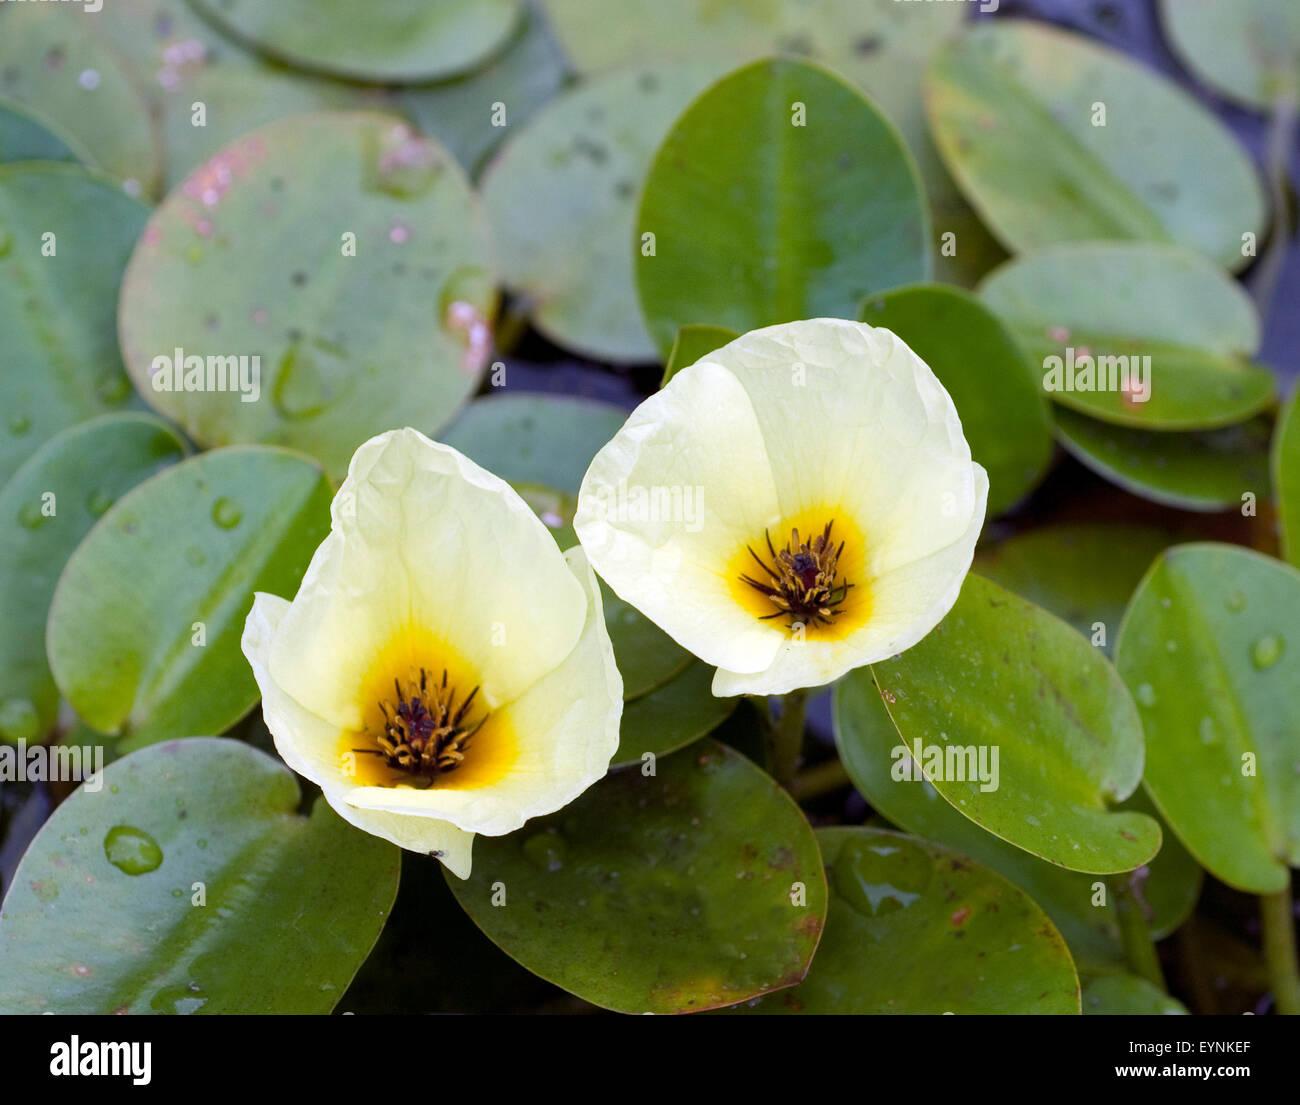 Wassermohn; Hydrocleys, nymphoides; - Stock Image